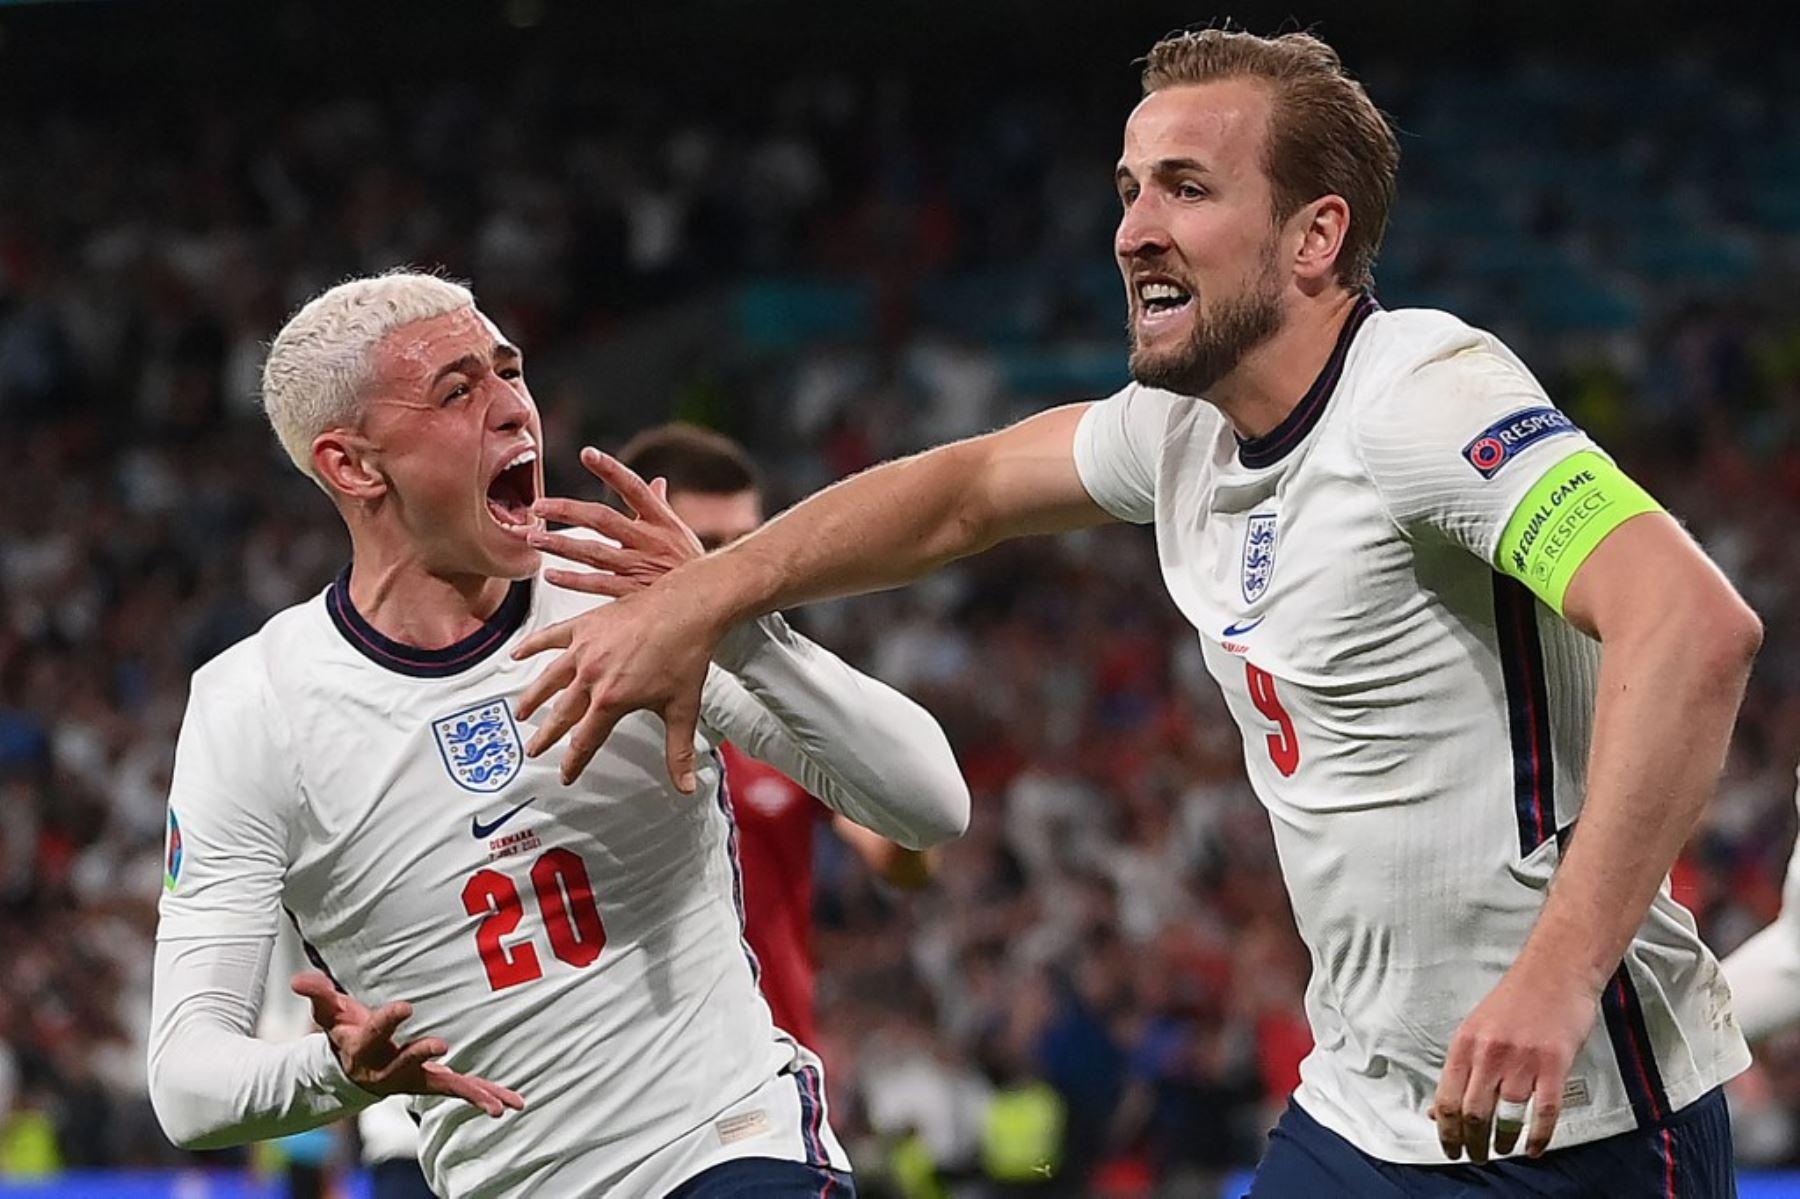 Inglaterra clasificó a la final de la Eurocopa 2020 tras derrotar 2-1 a Dinamarca.